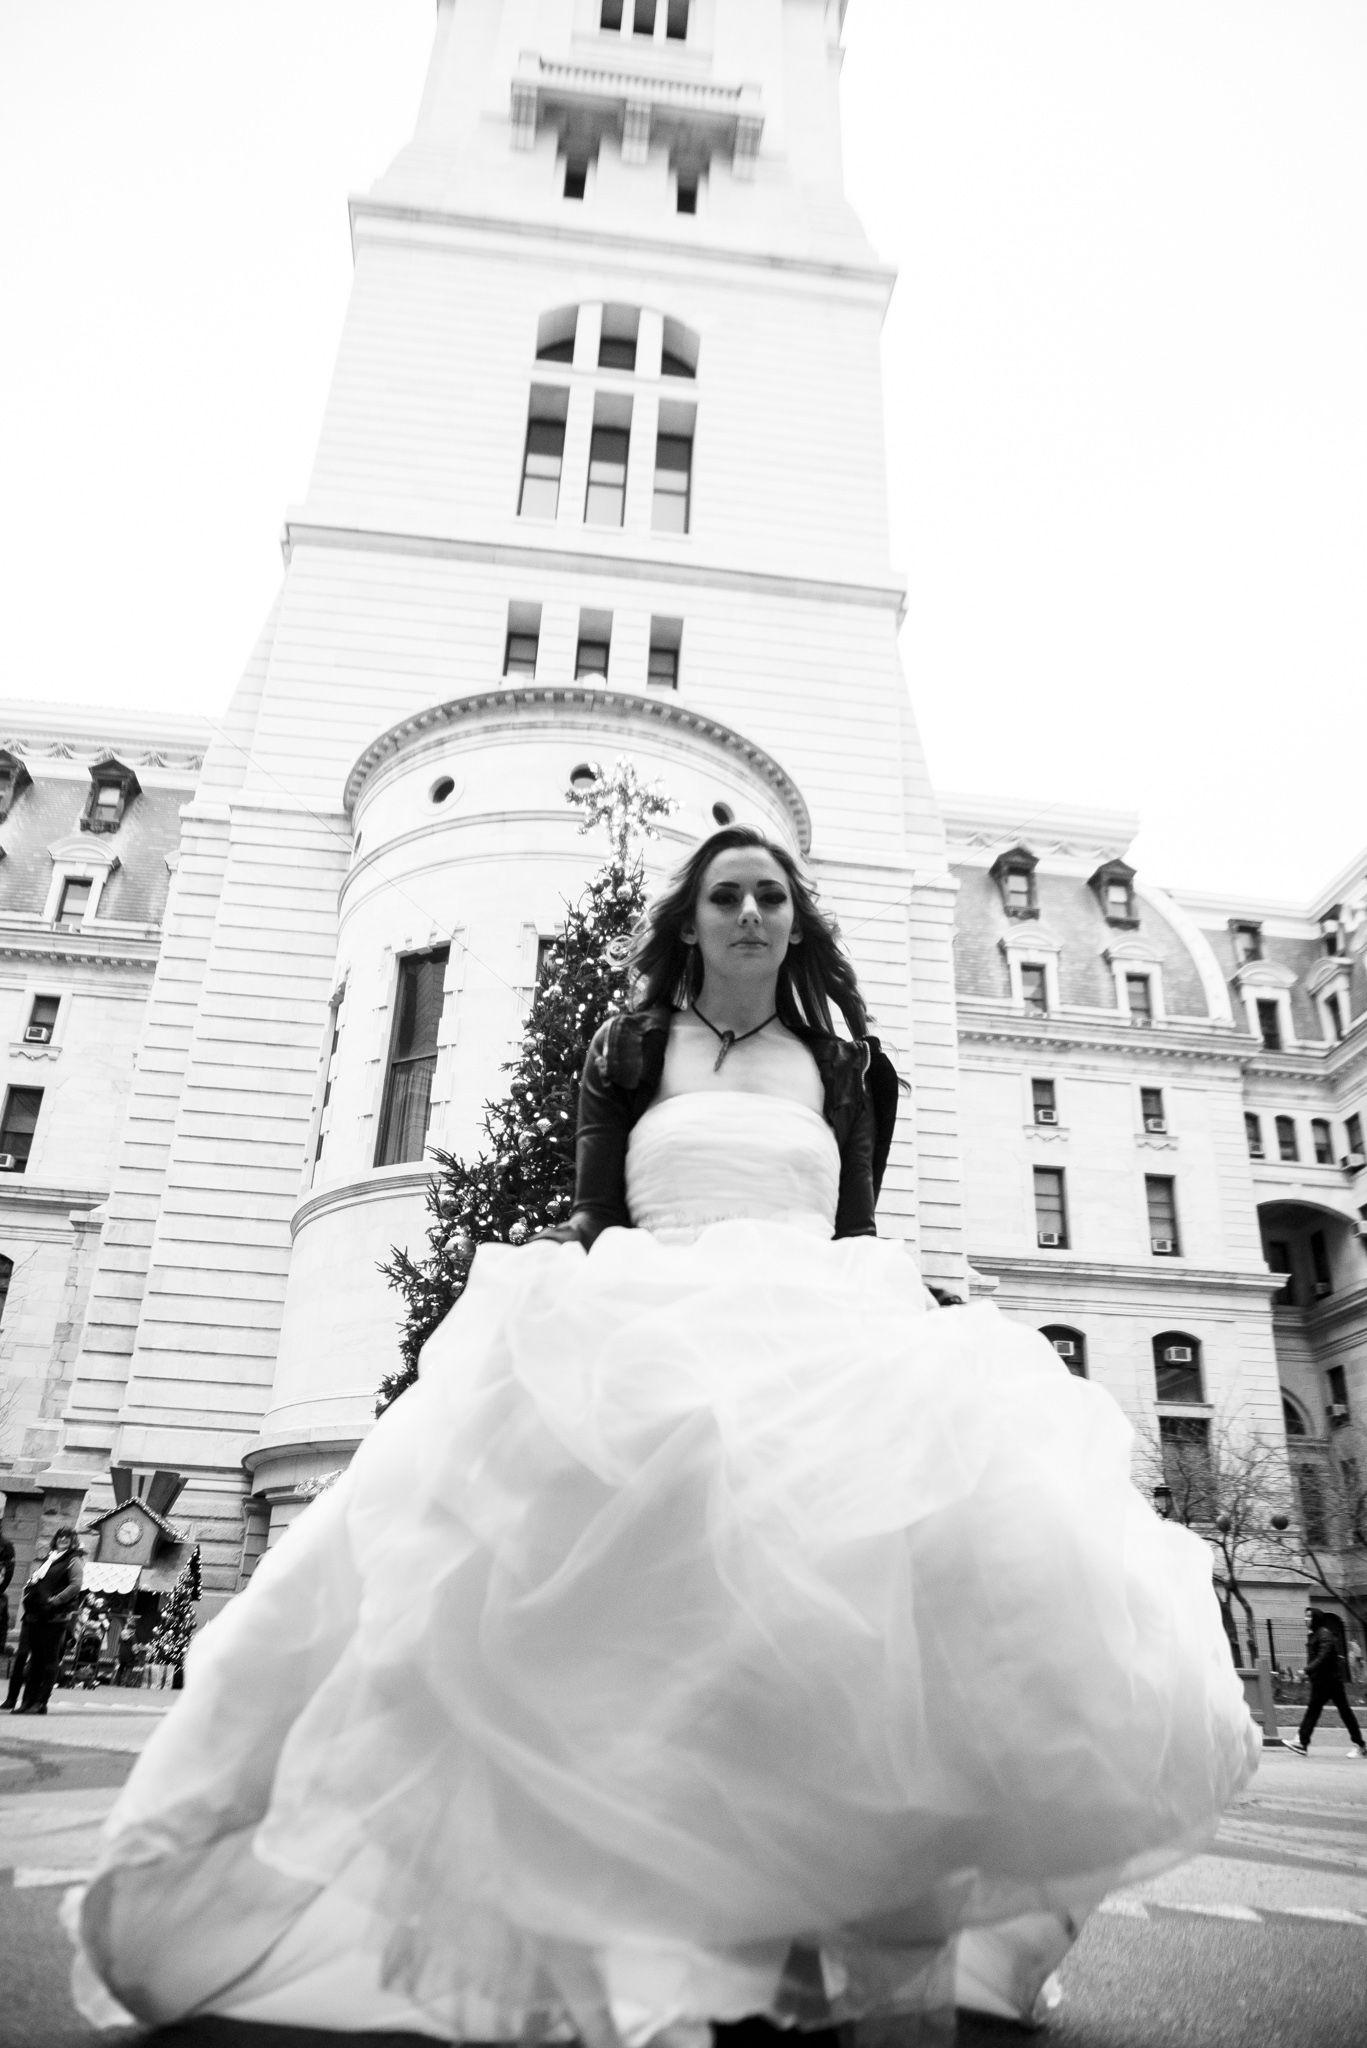 Black white wedding dress  Gorgeous photo by Black White u Raw Photography uc  Our Brides